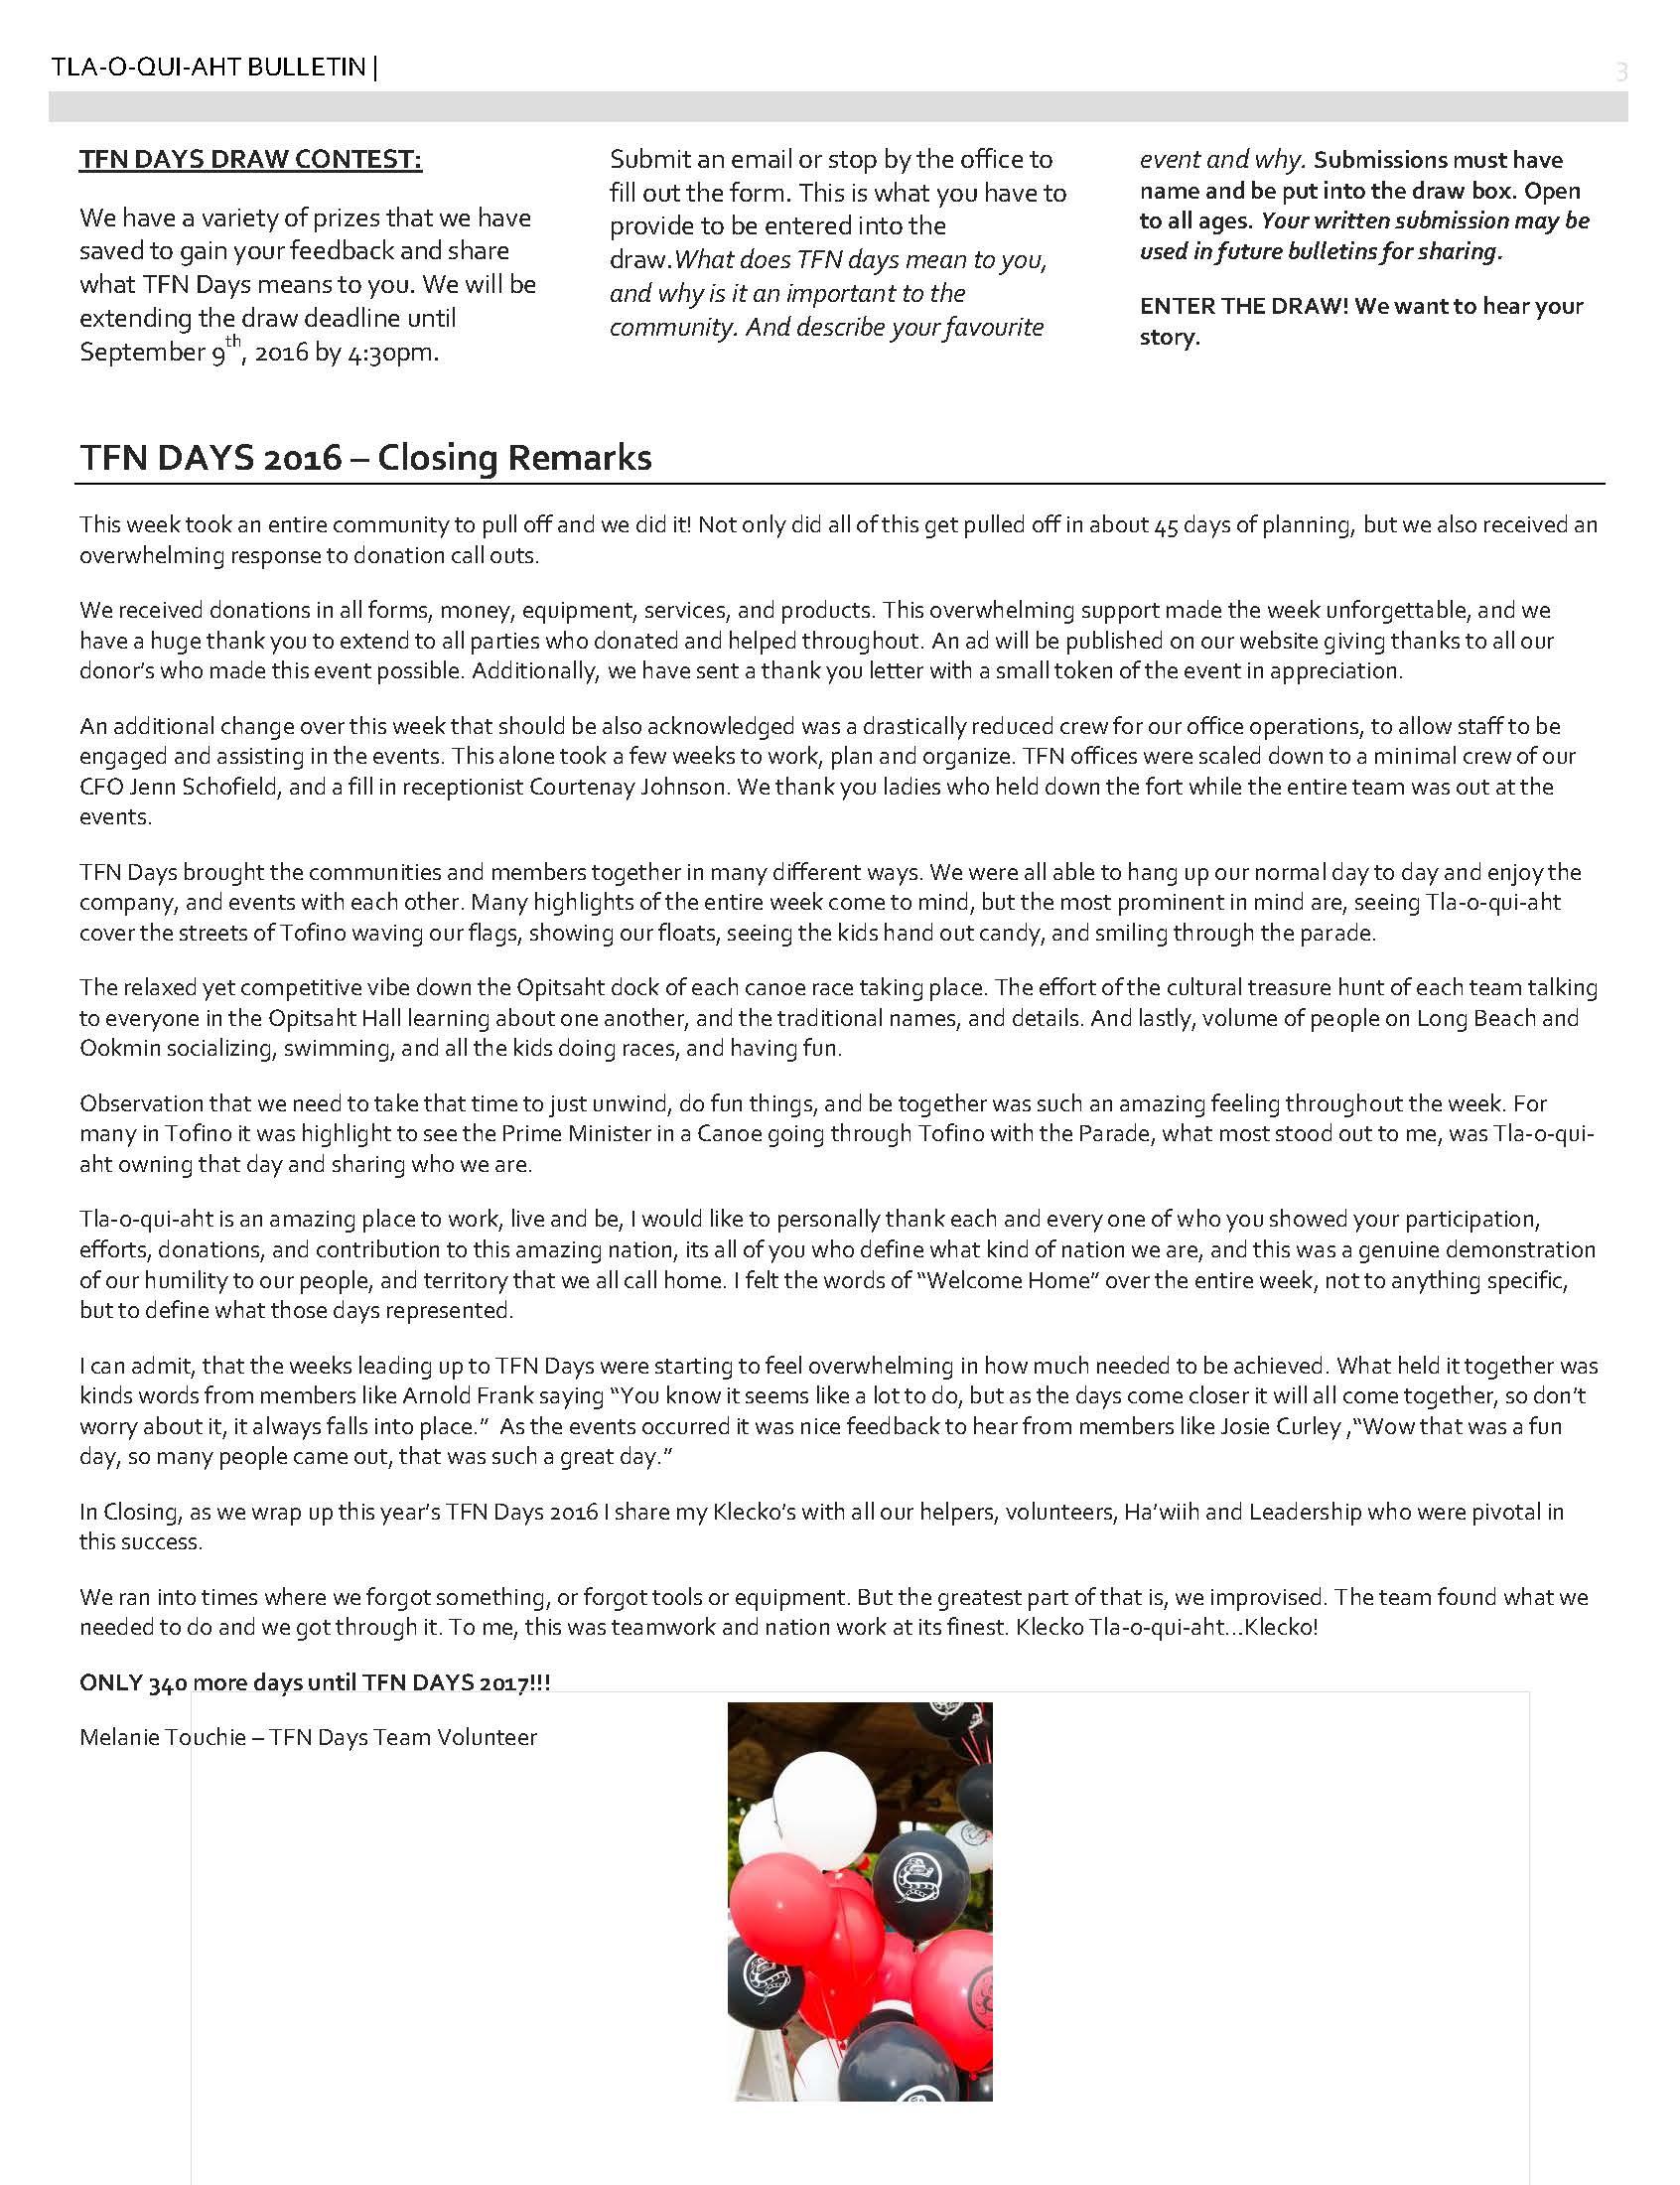 TFN Bulletin Sept 1-2016_Page_03.jpg